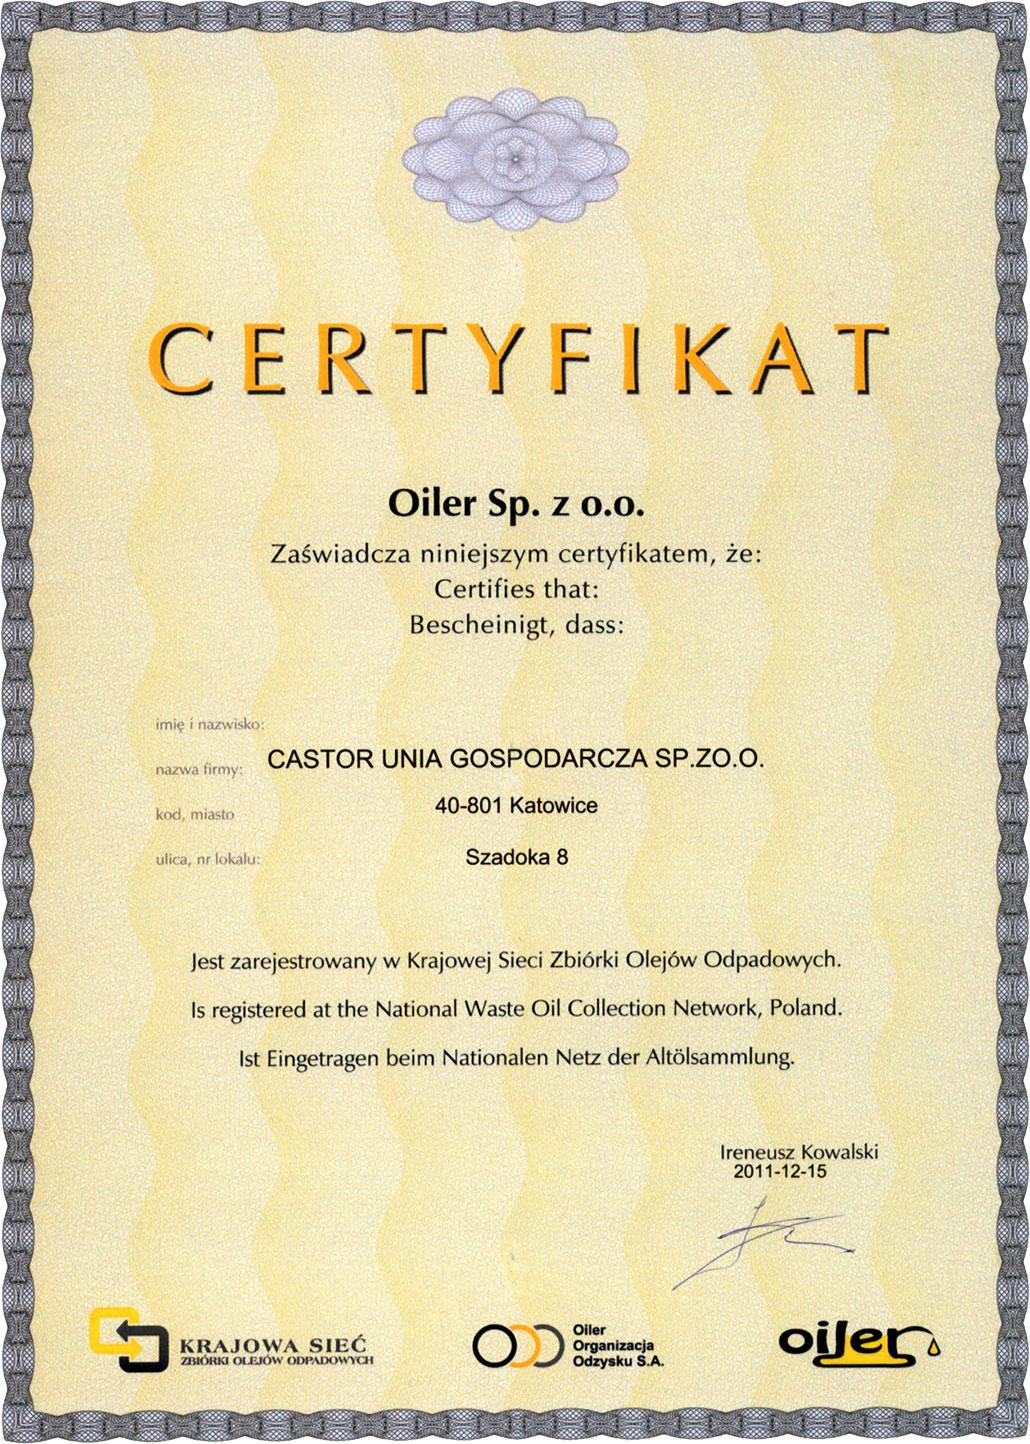 Certyfikat OILER